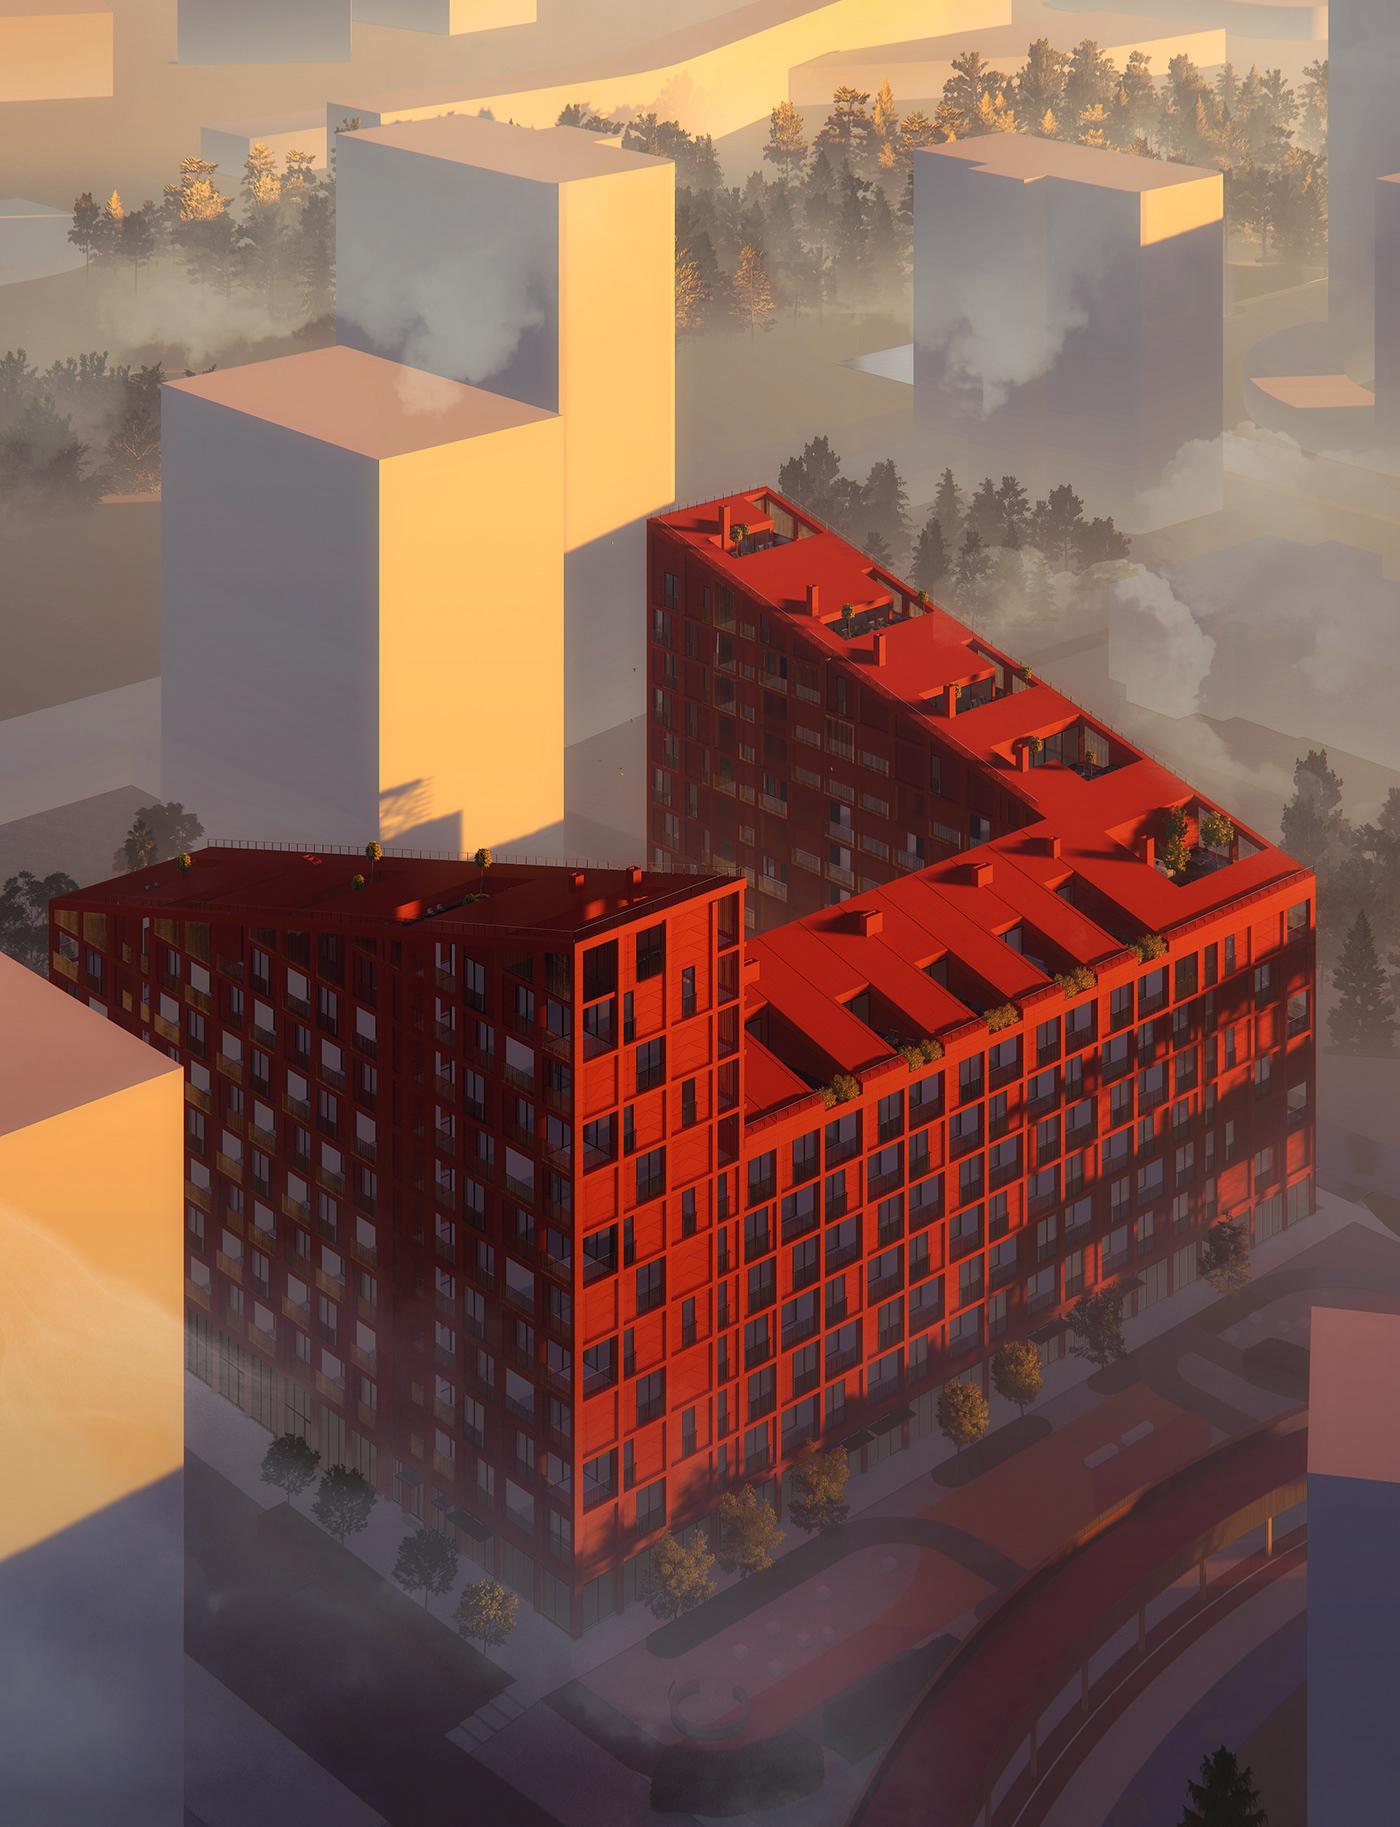 architecture gallery housing interior design  Landscape publicspace visualization